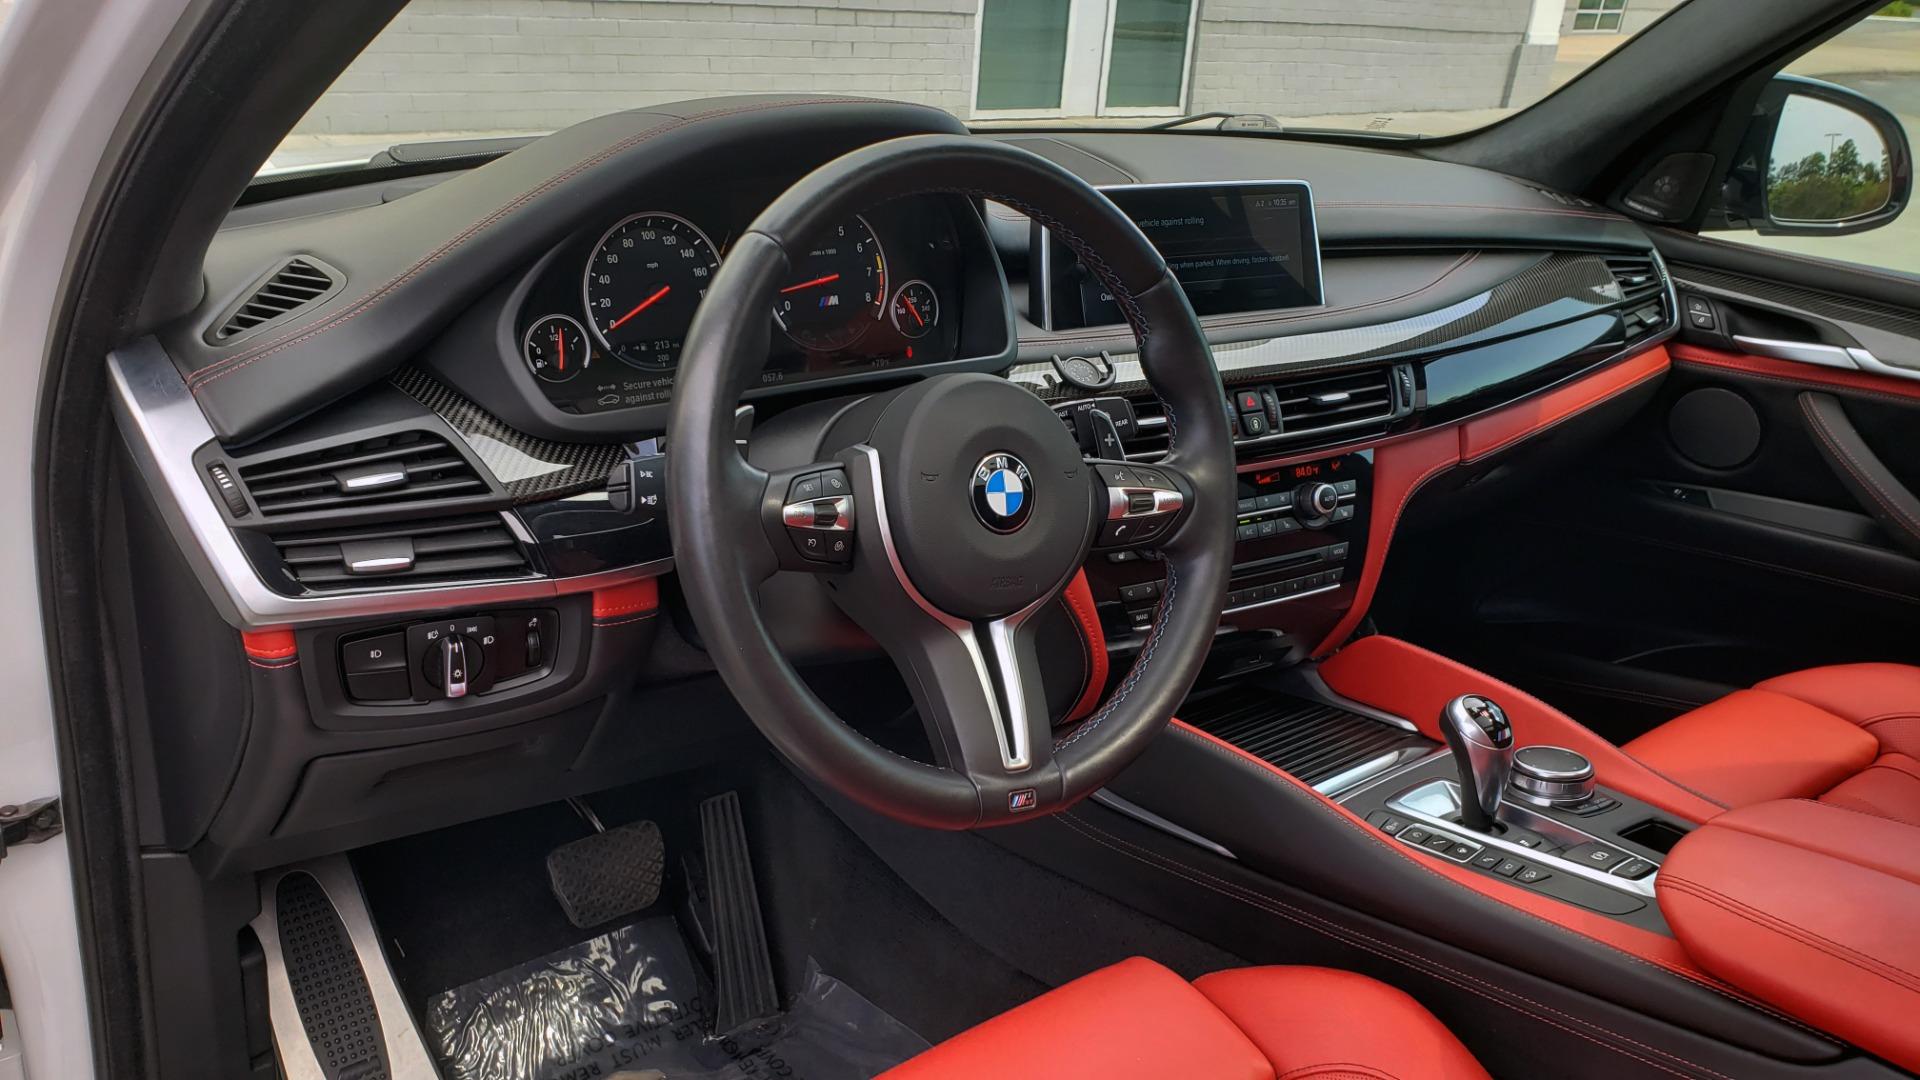 Used 2017 BMW X5 M EXECUTIVE PKG / NAV / DRVR ASST / BSM / HUD / HTD STS / WIFI for sale Sold at Formula Imports in Charlotte NC 28227 34